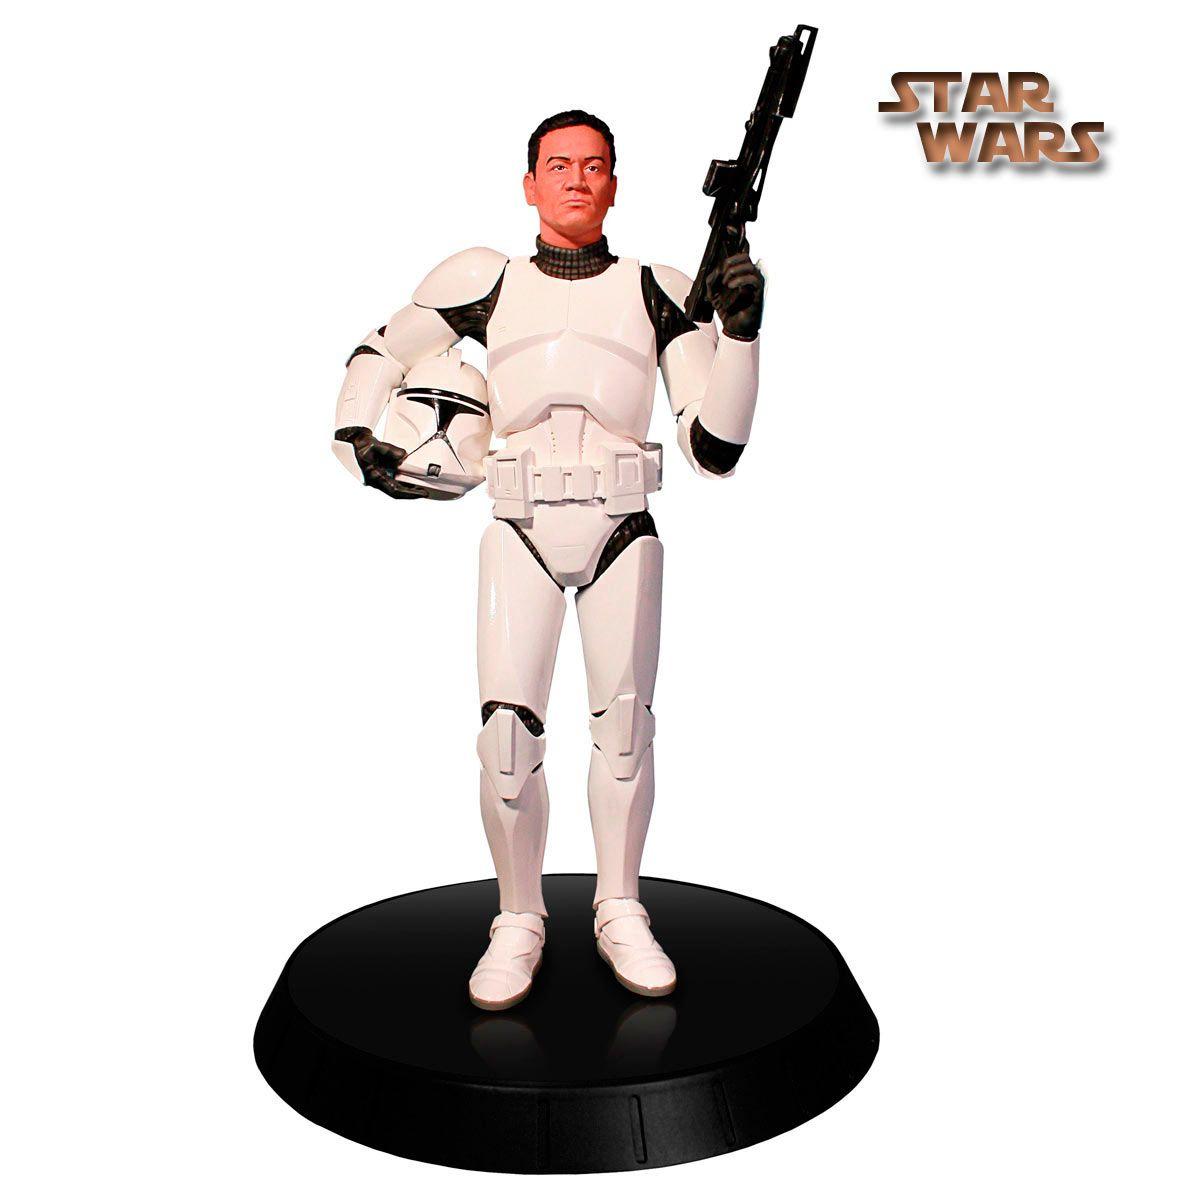 Estatua Star Wars, White Clone Trooper, deluxe 30cm, Gentle Giant Estatua de 30cm de altura, fabricada por Gentle Giant, del soldado Clone Trooper en una nueva versión deluxe.